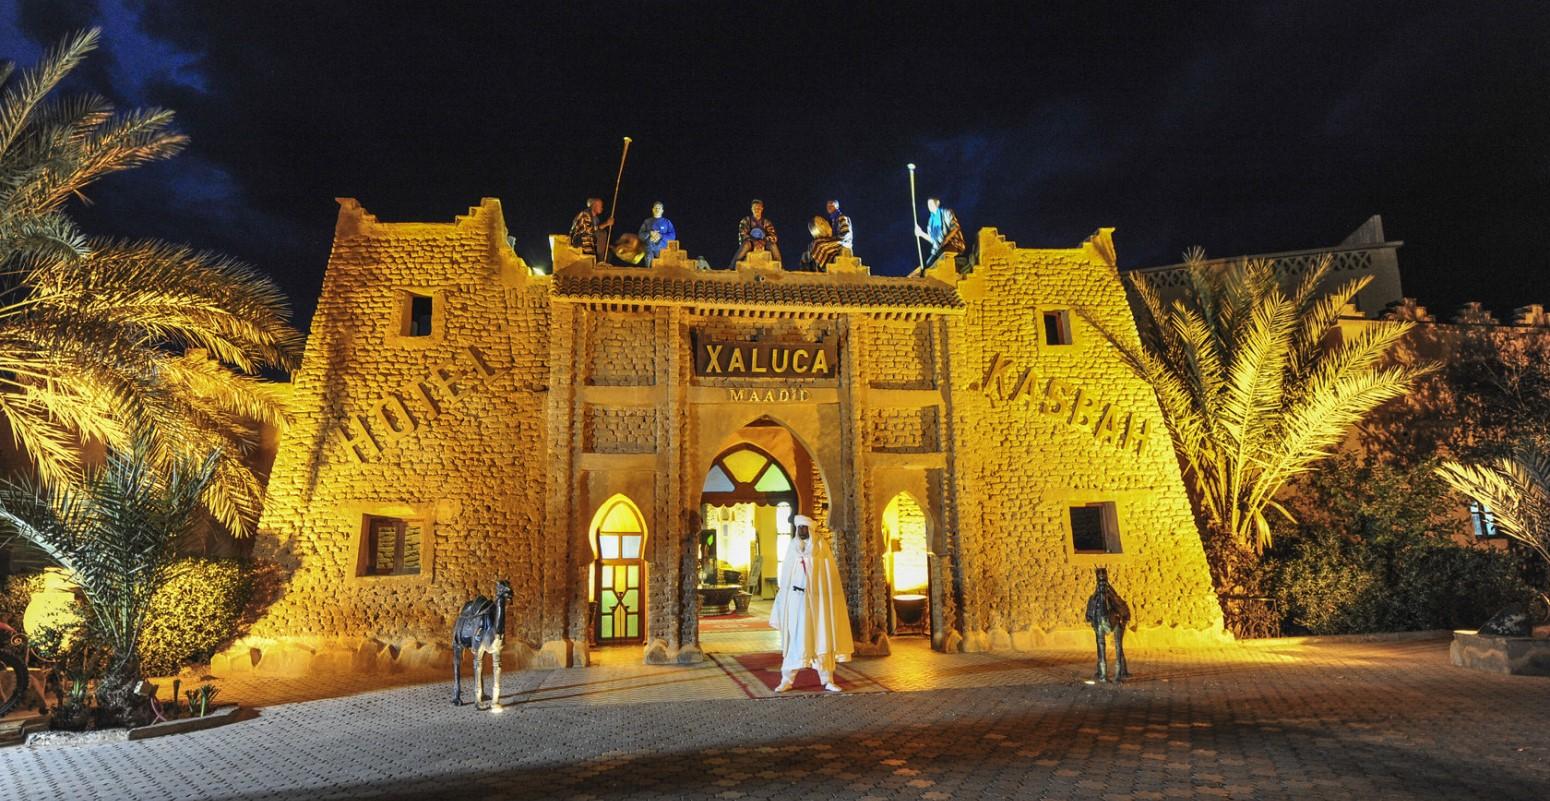 General Kasbah Hotel Xaluca 8